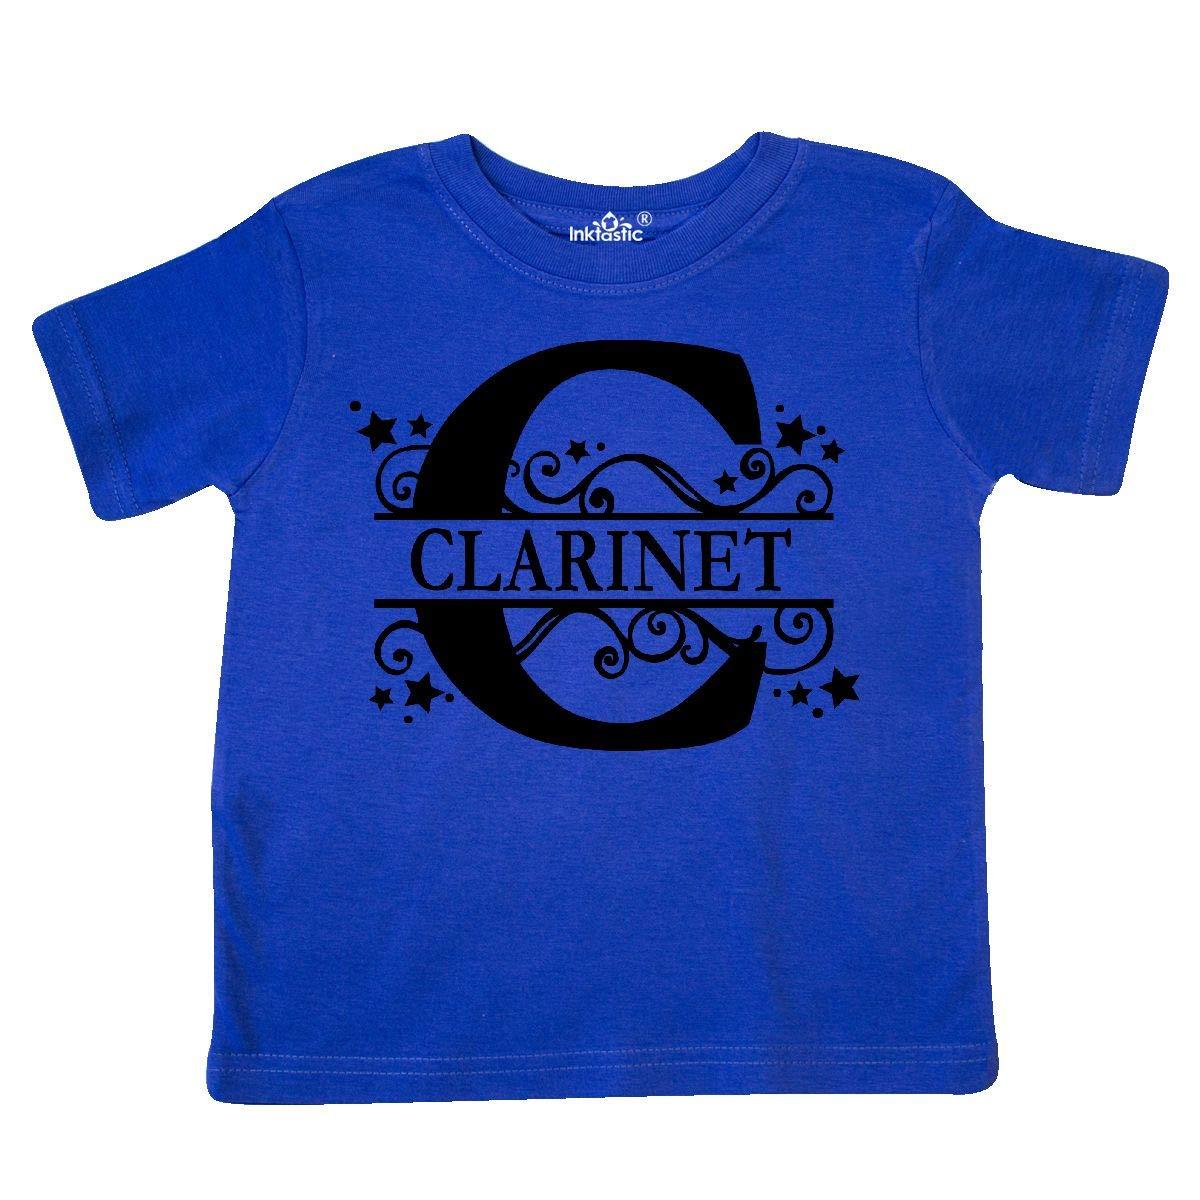 inktastic Clarinet Letter C Full Image Toddler T-Shirt